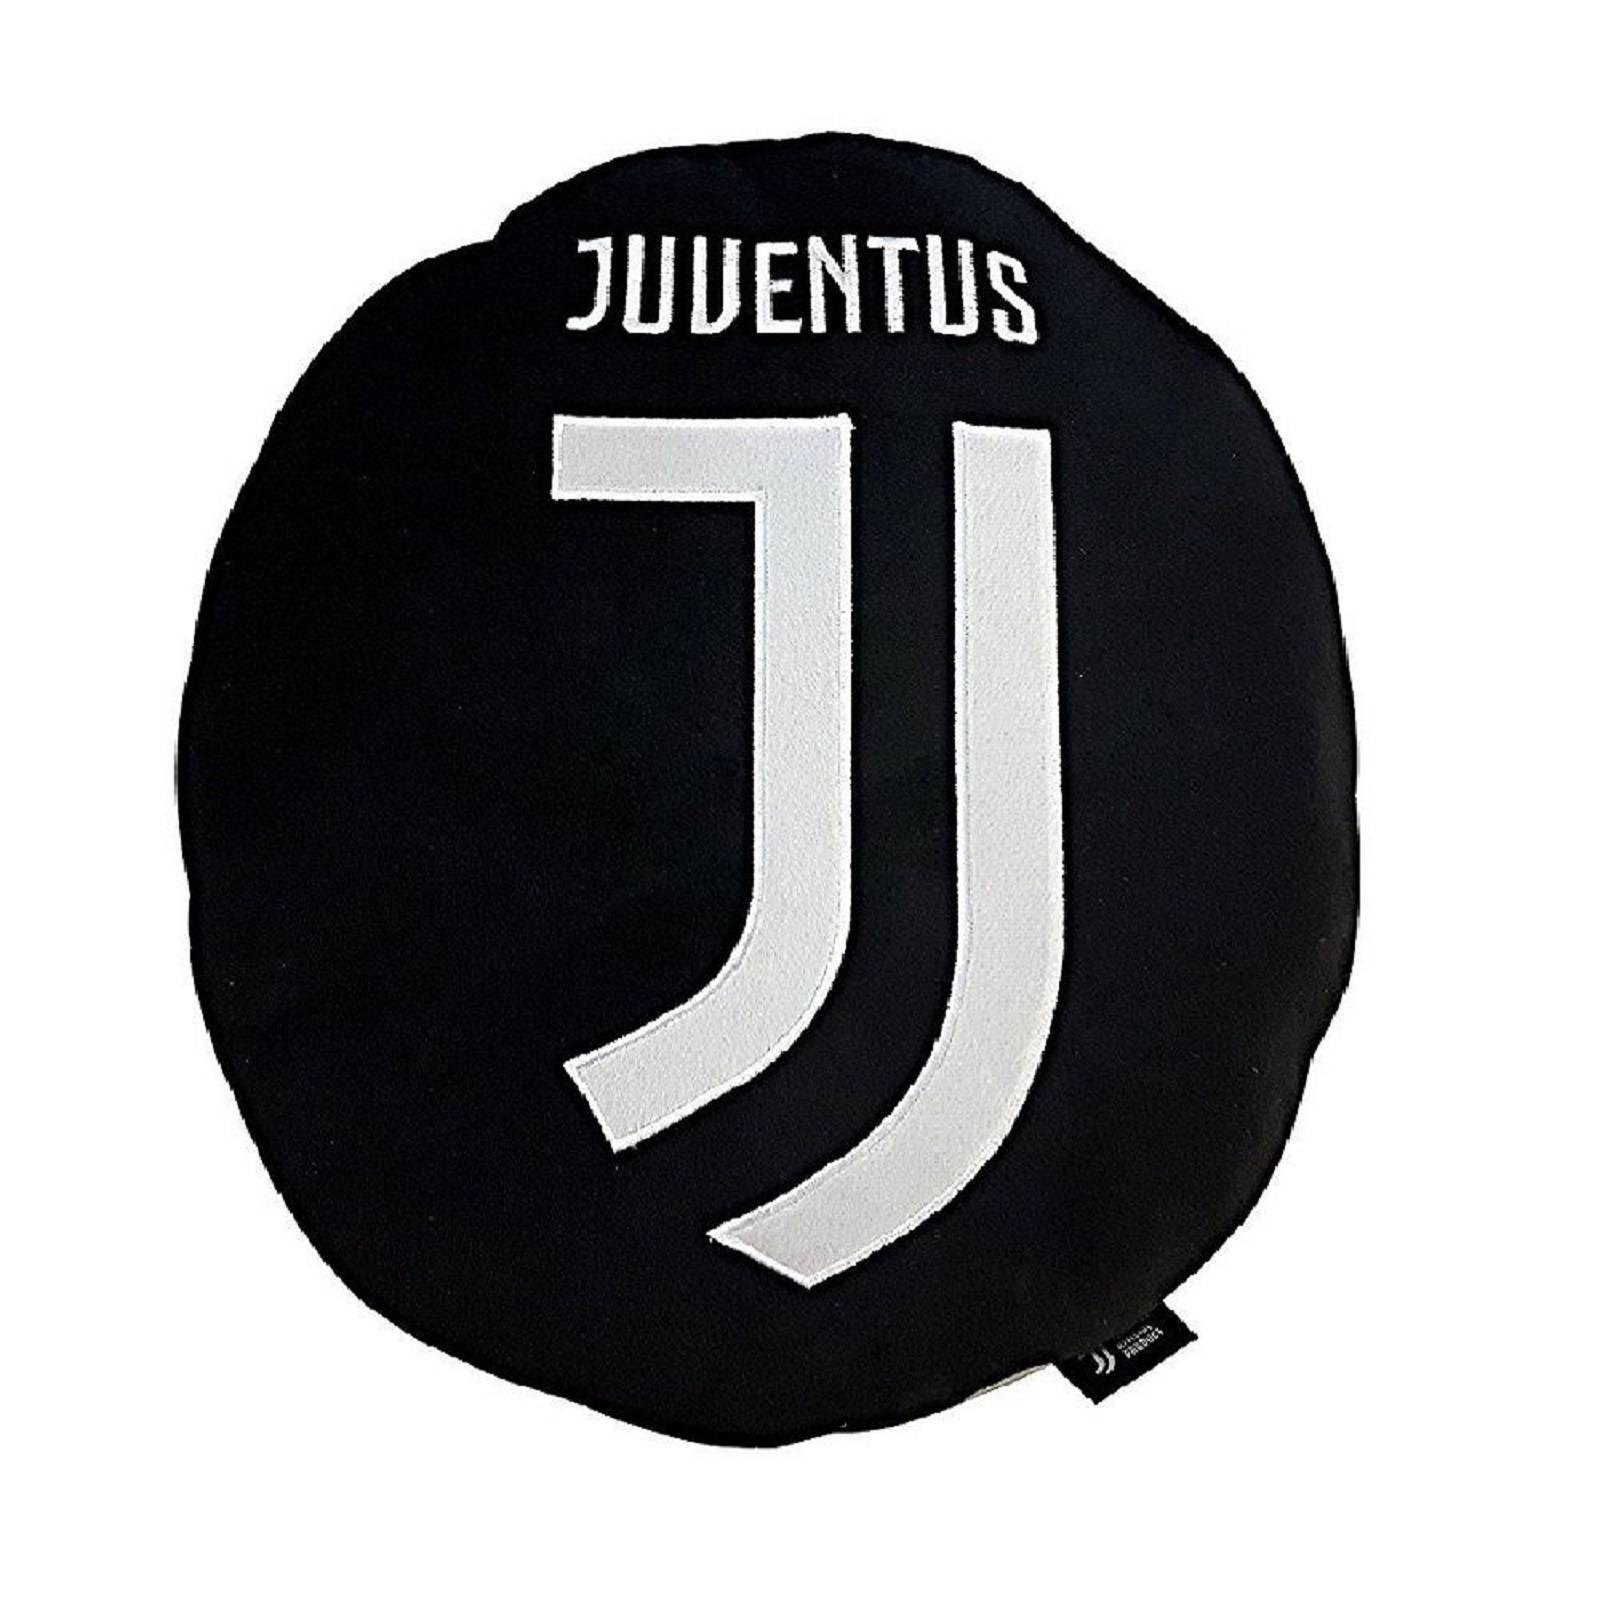 Juventus nuovo logo cuscino arredo sagomato cm 40x40 for Letto logo